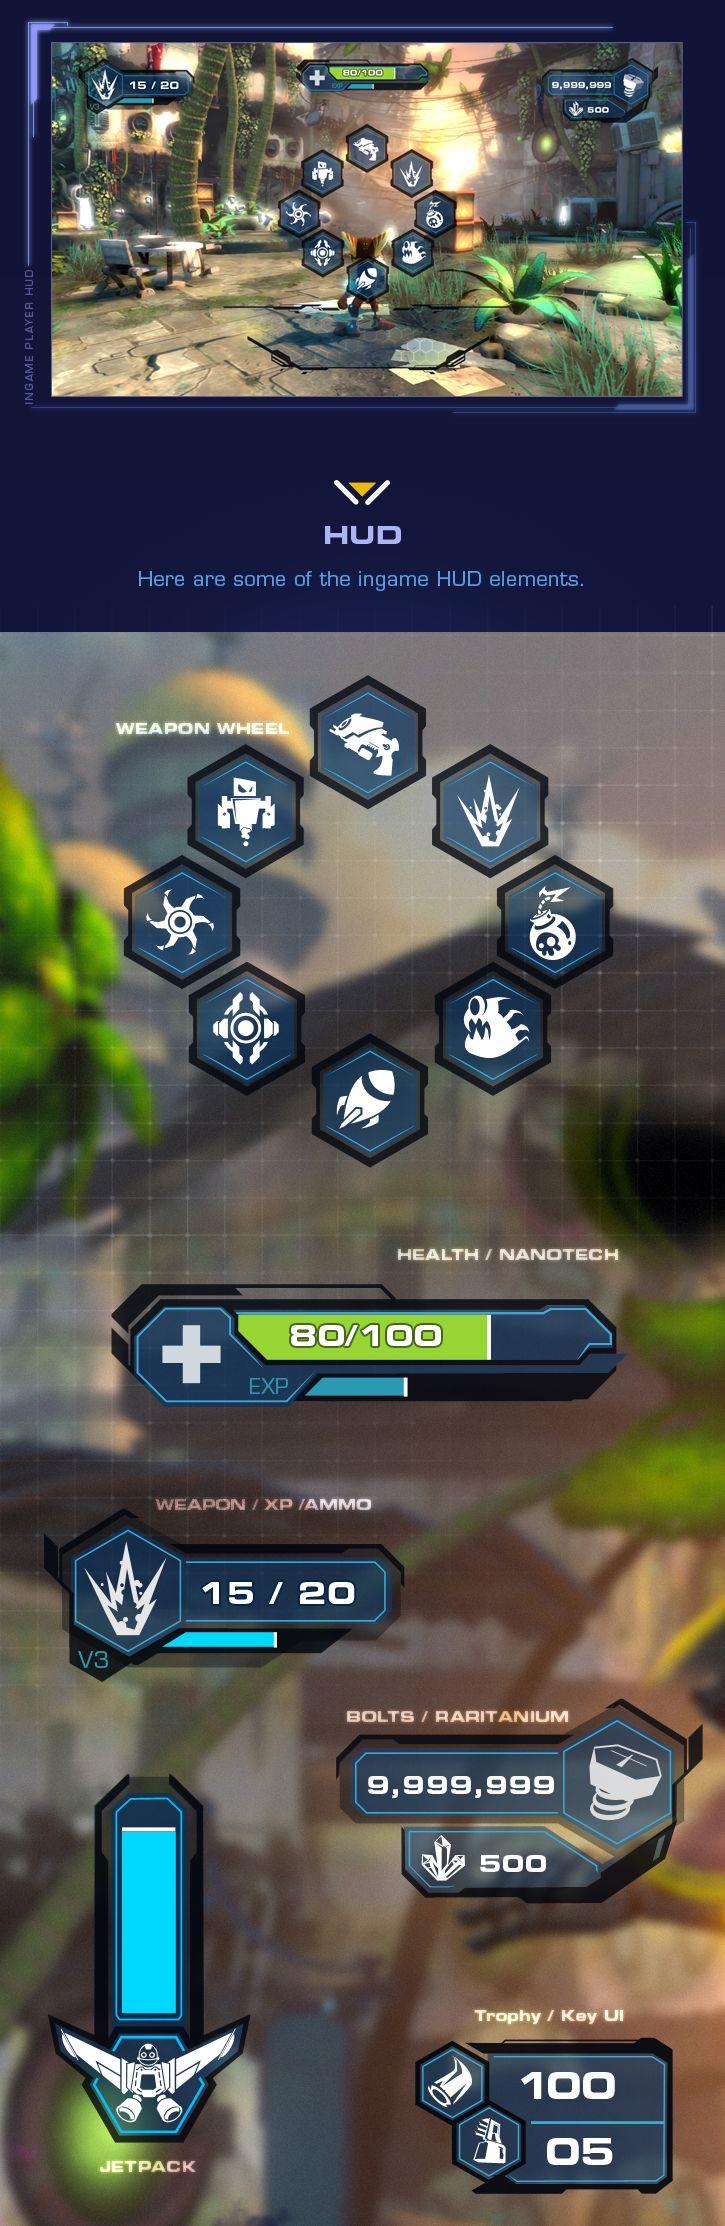 Ratchet and Clank | Into the Nexus UI art on Behance